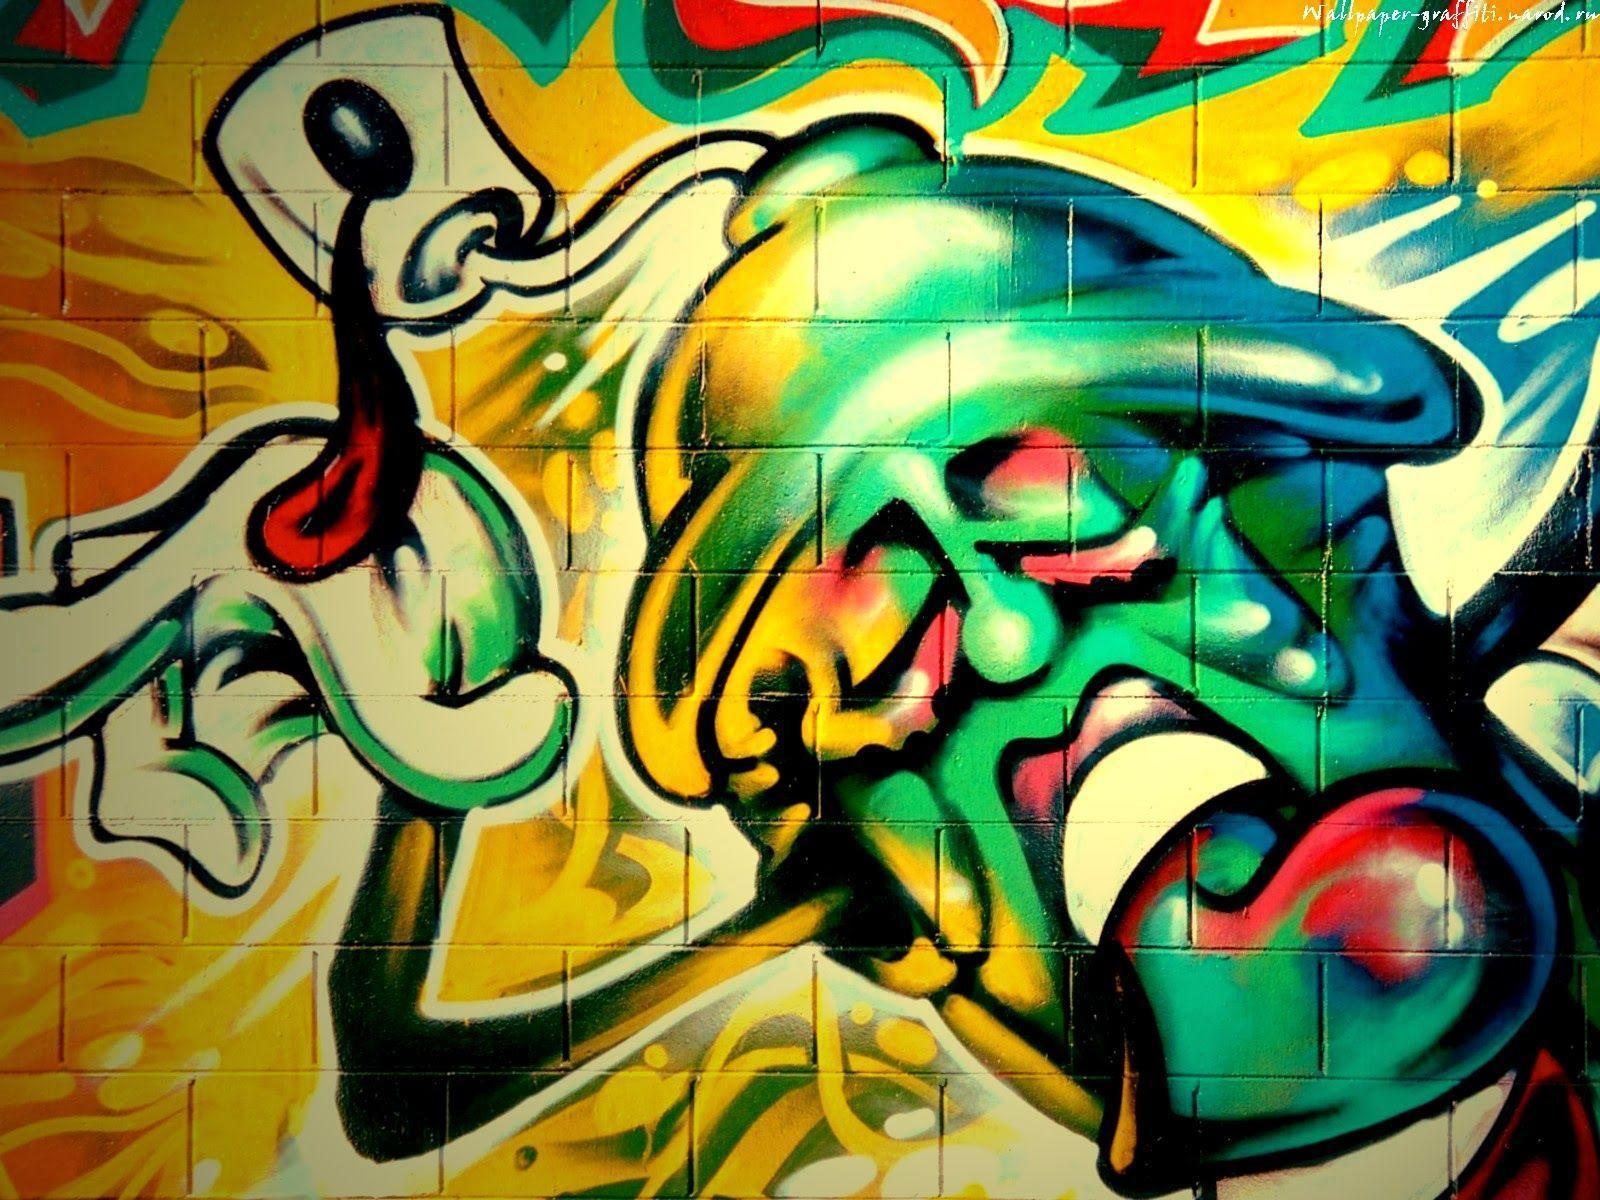 Graffiti creator styles graffiti wallpaper best games wallpapers